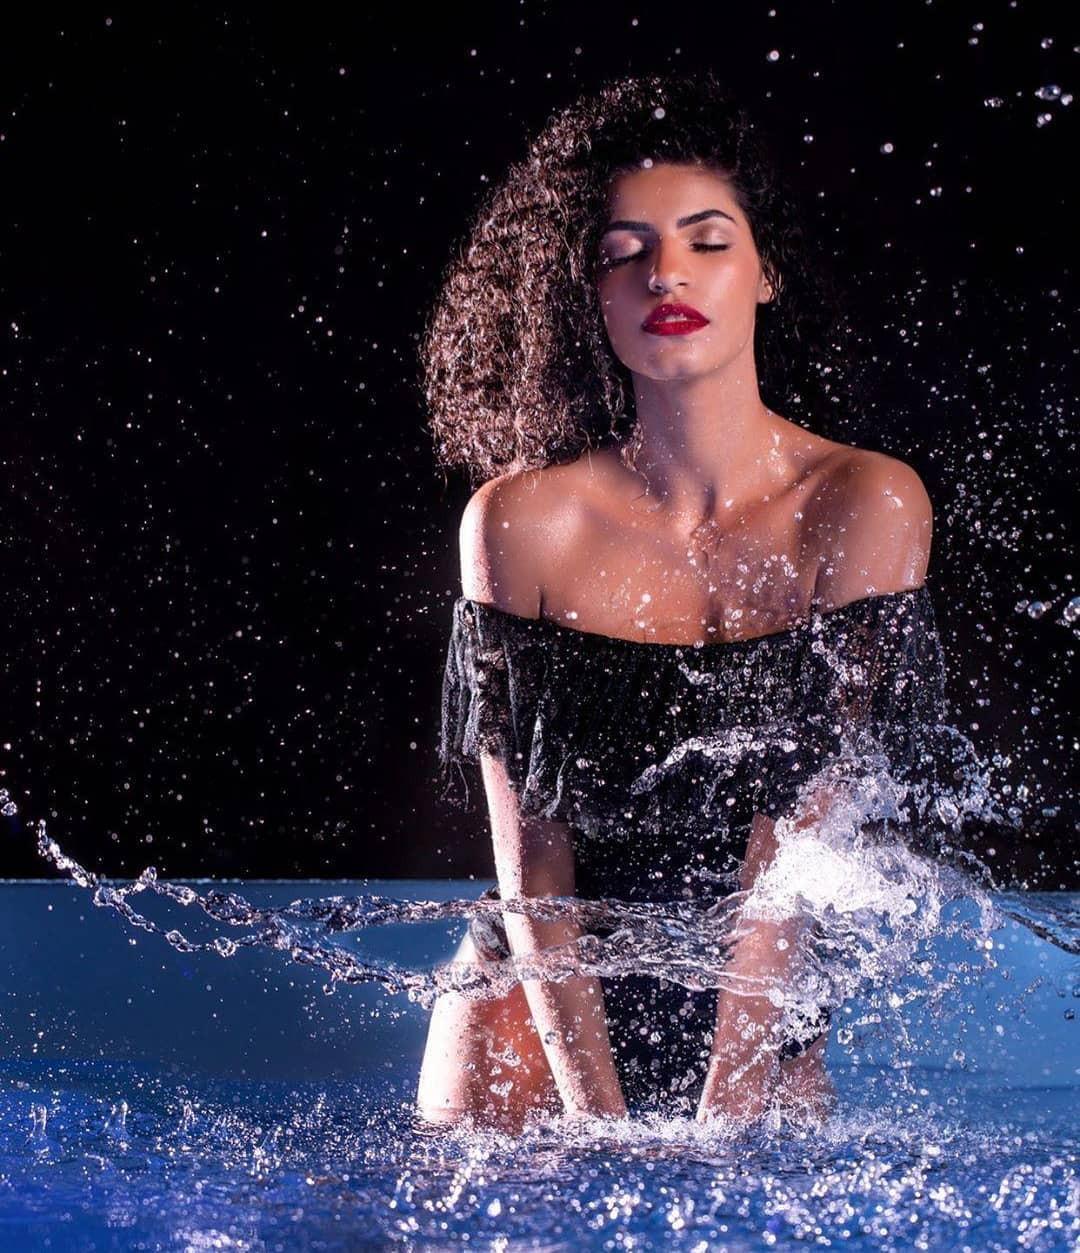 geicyelly mendes, top 20 de miss brasil mundo 2019. - Página 2 Fh8p2v10